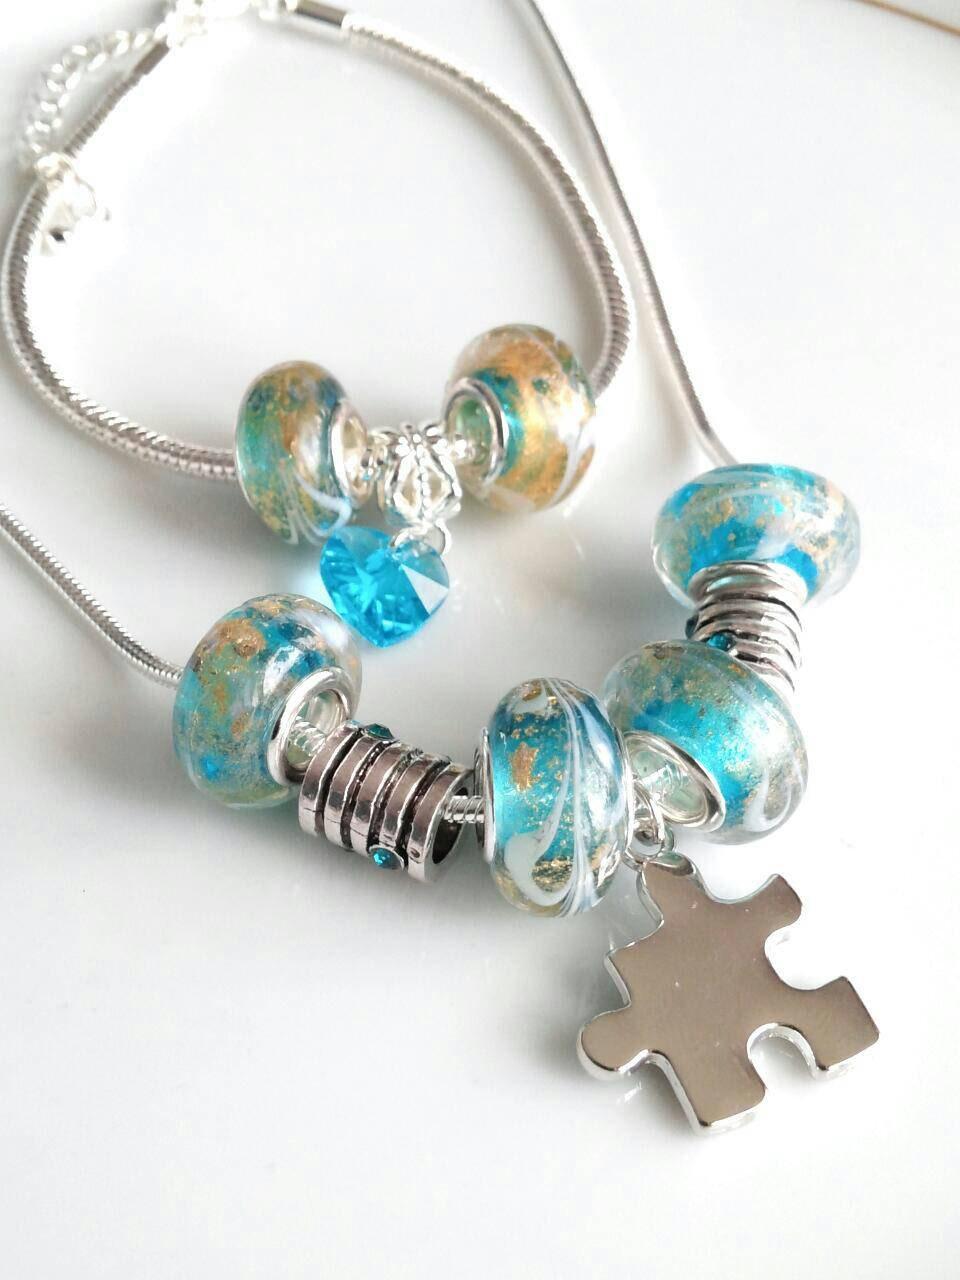 autism necklace autism bracelet set autism awareness jewelry